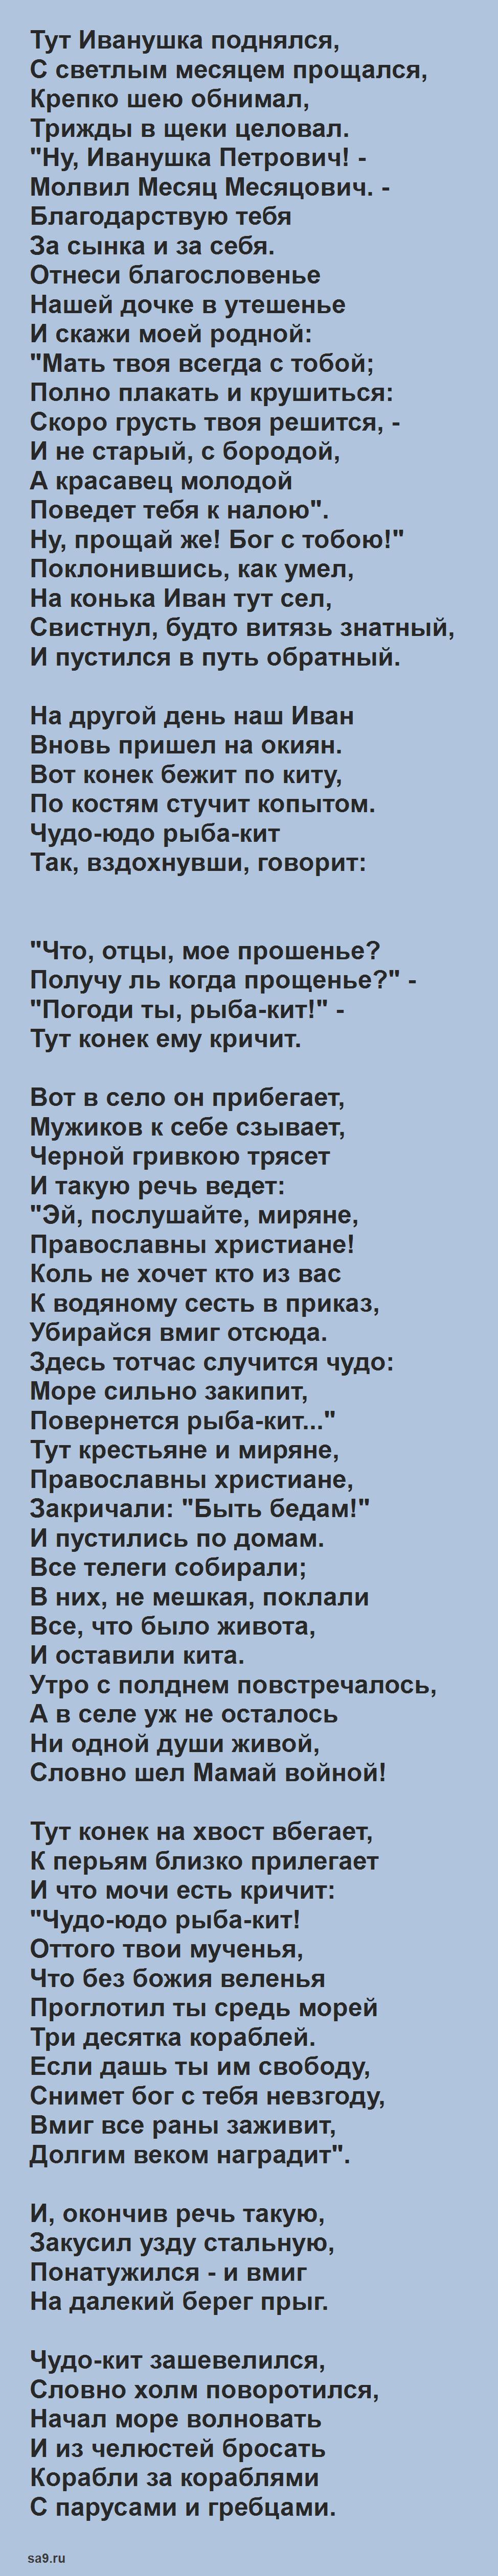 'Конек-Горбунок' сказка